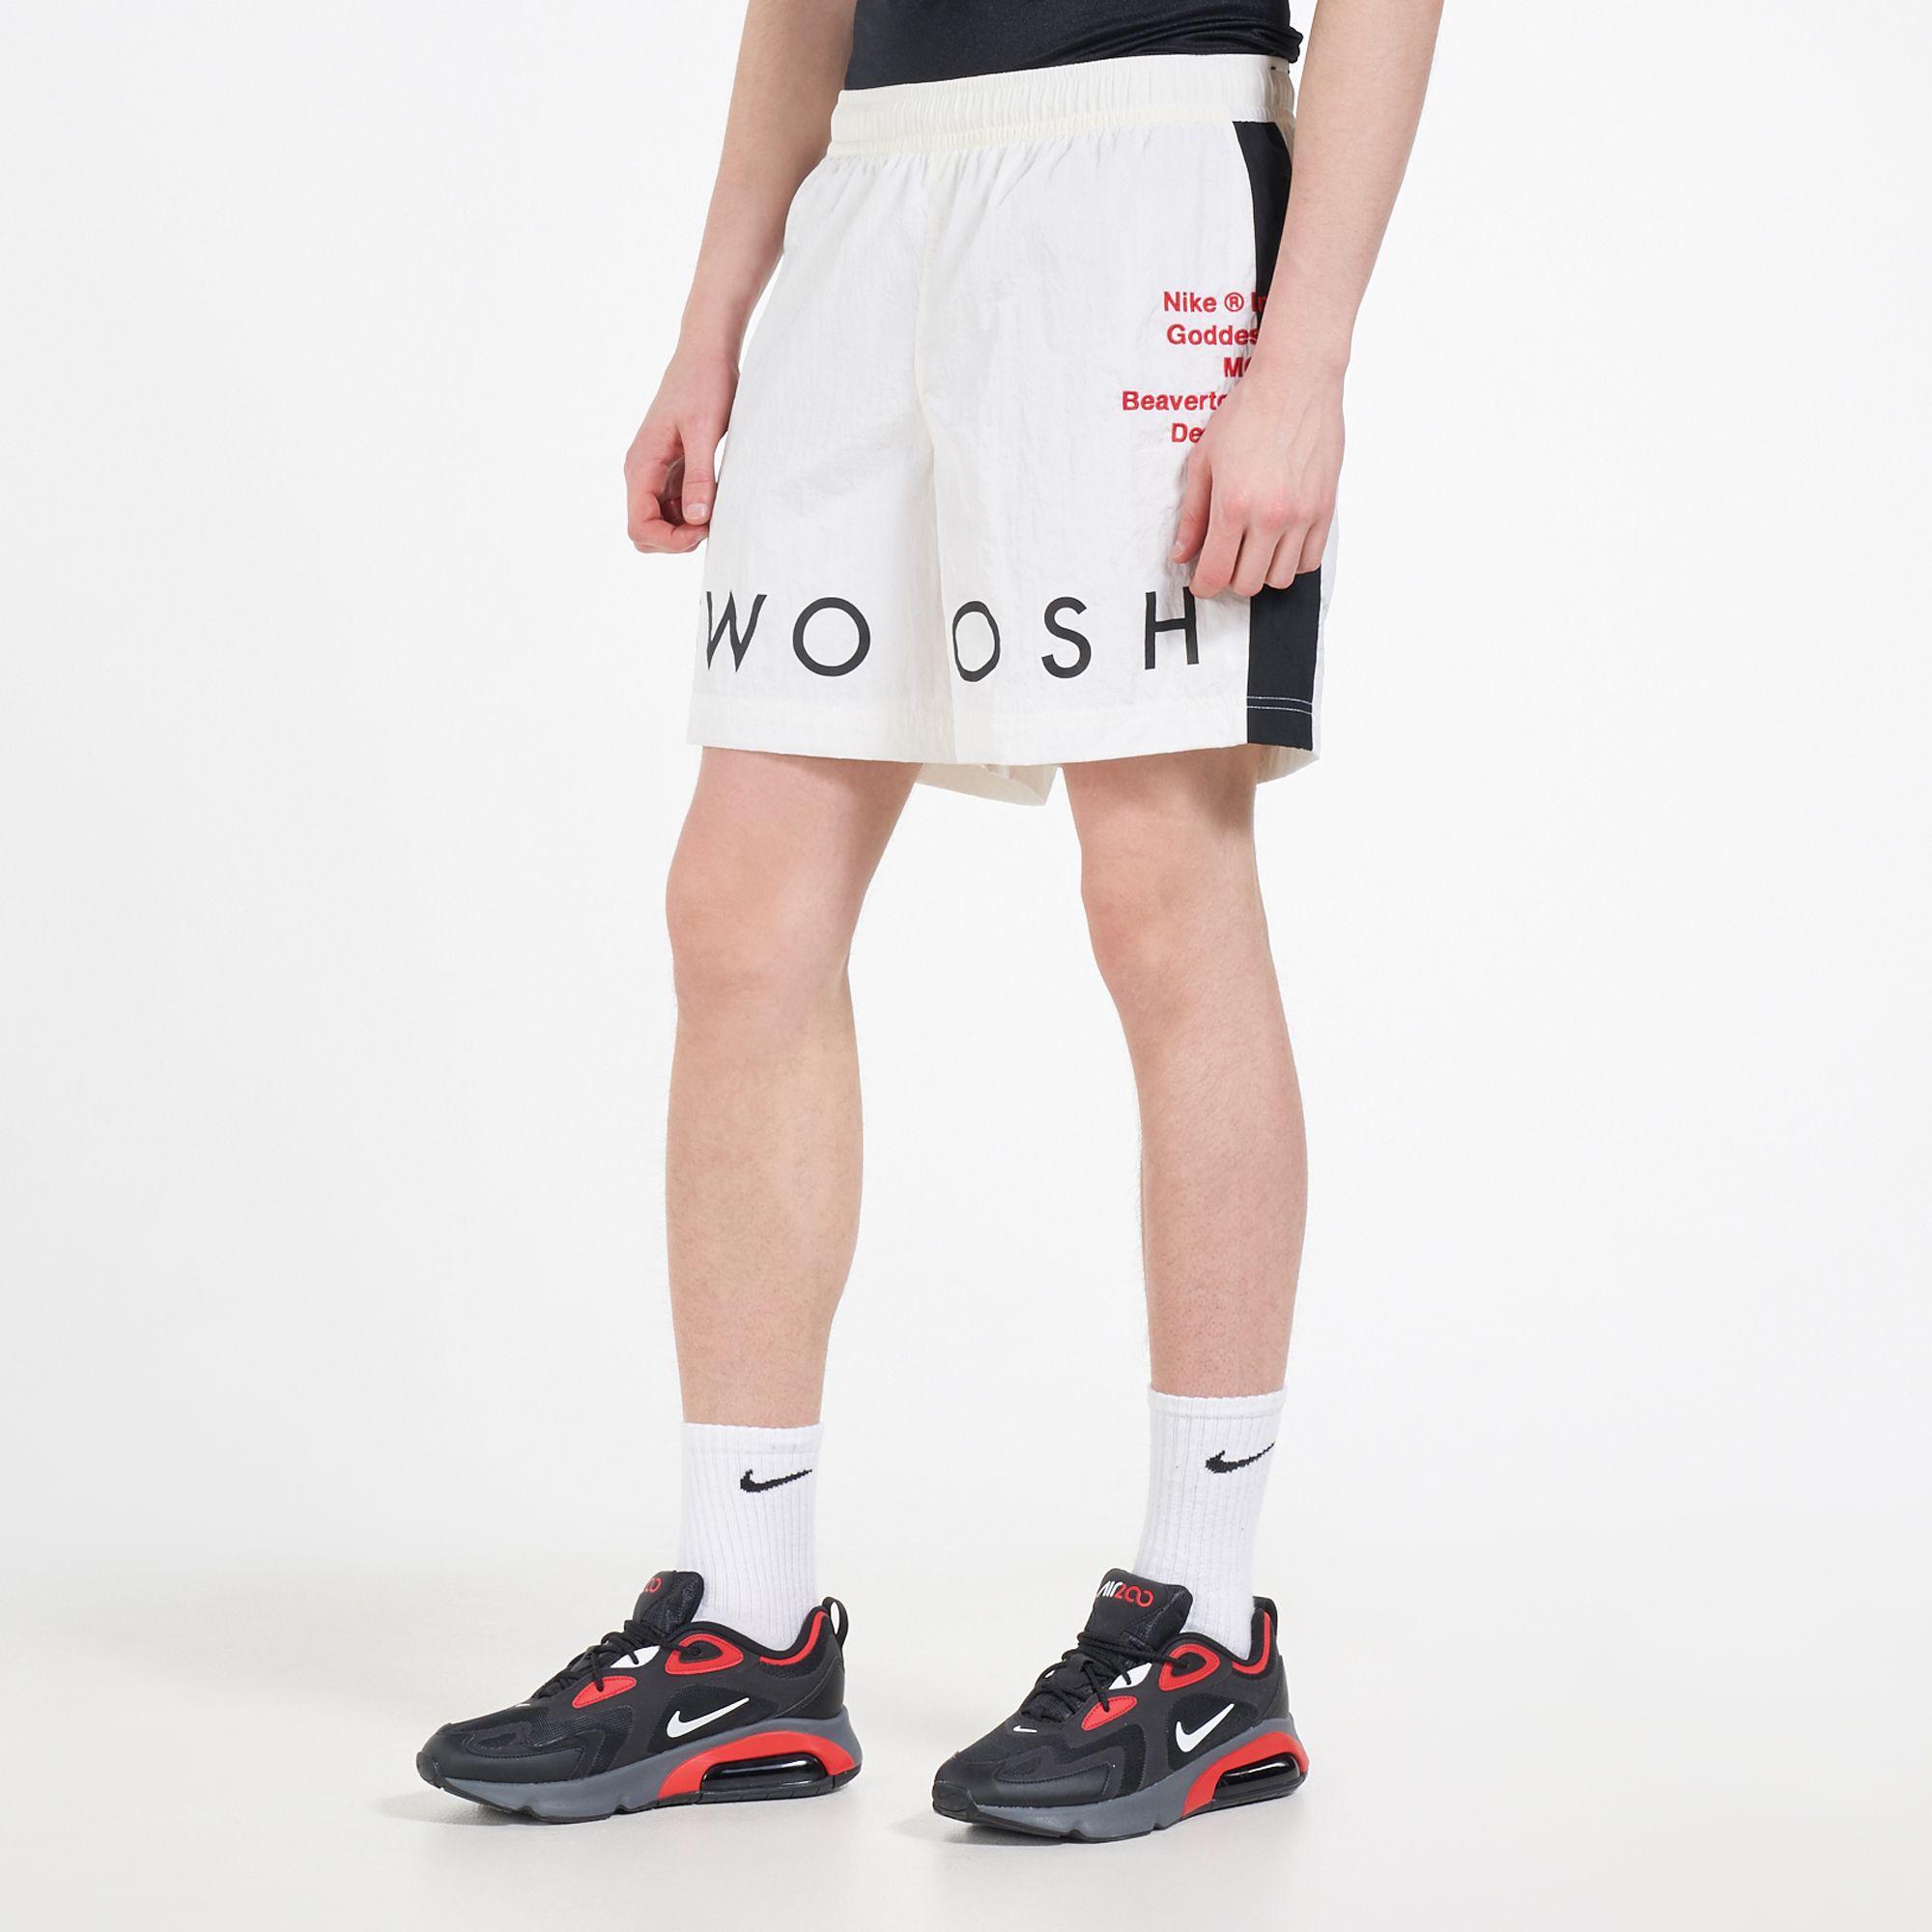 calidad autentica precio razonable atarse en Nike Men's Sportswear Swoosh Woven Shorts   Shorts   Clothing   Mens   SSS